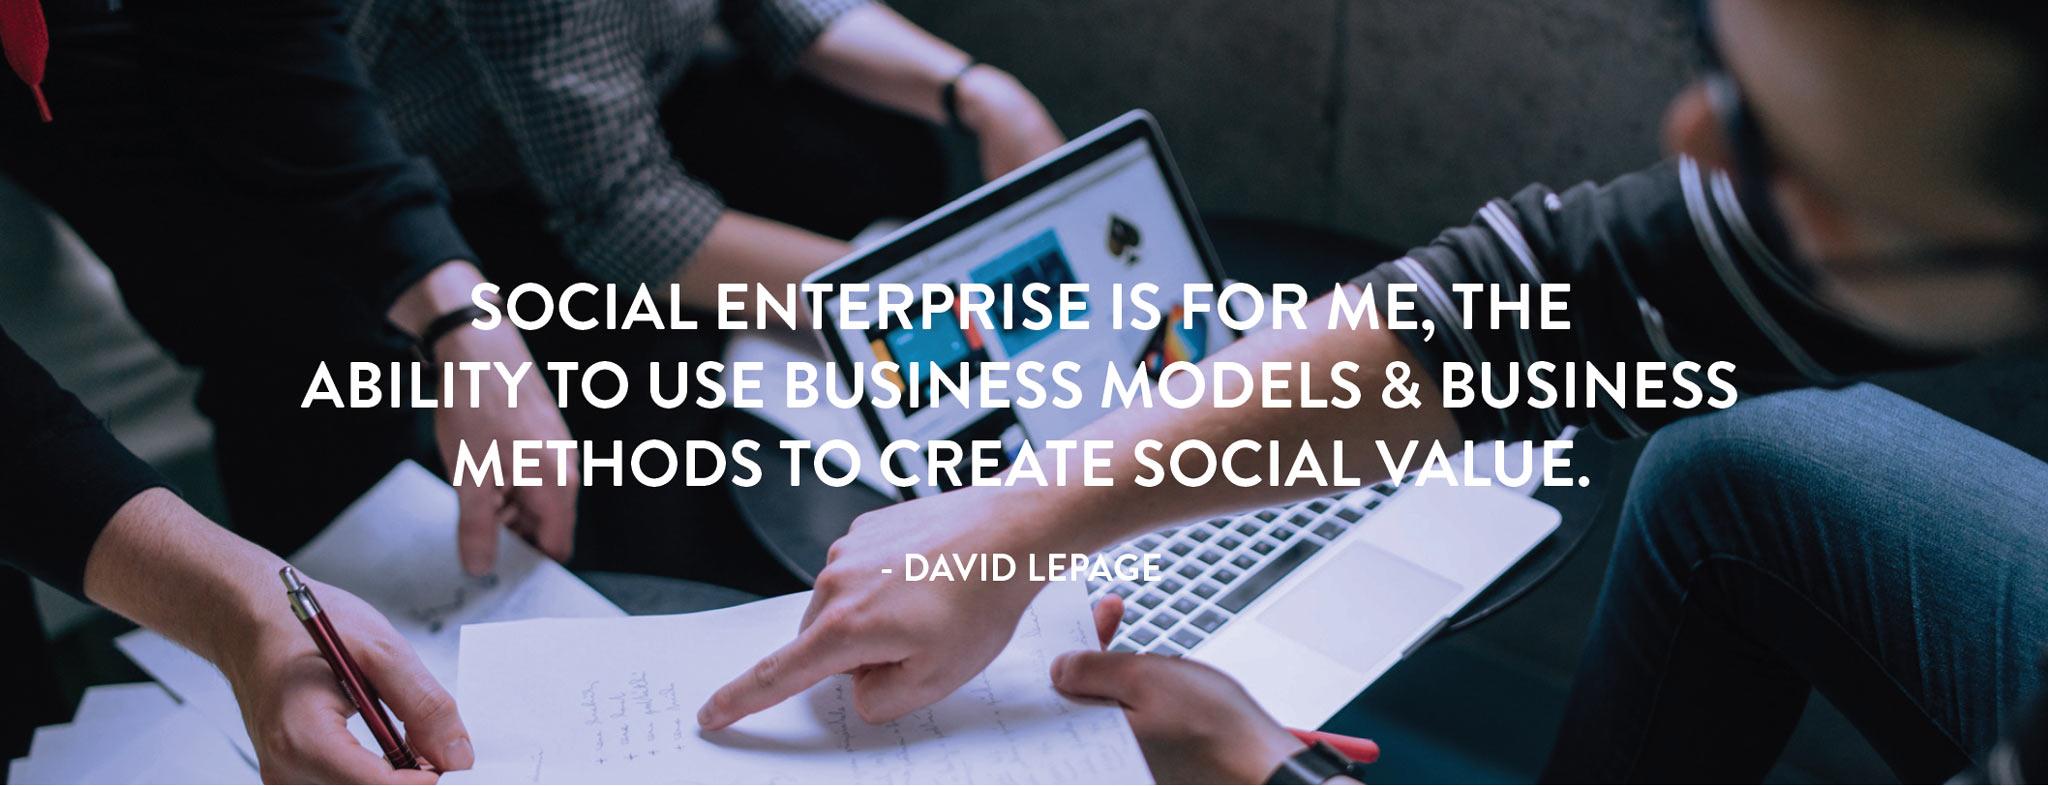 Social-enterprise-is-for-me-quote.jpg